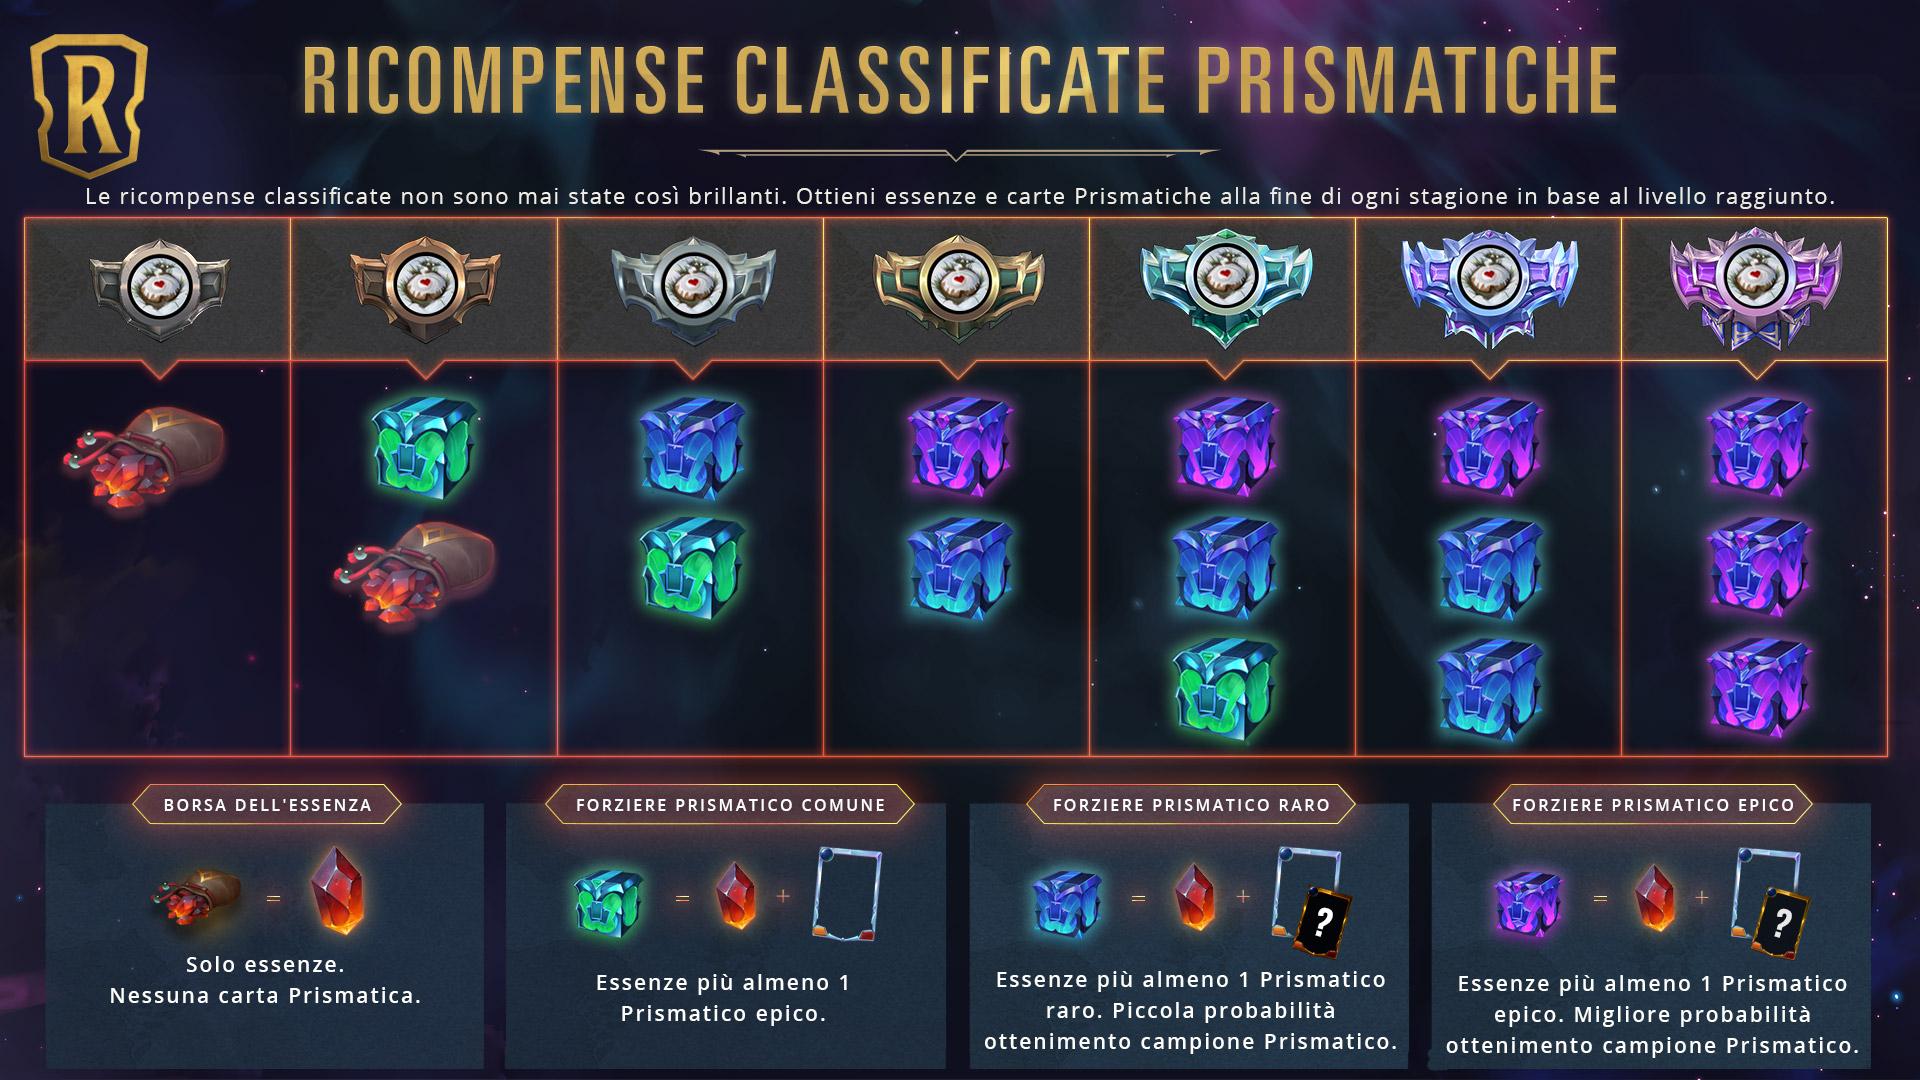 Prismatic_Ranked_Rewards_Modal-ita.jpg